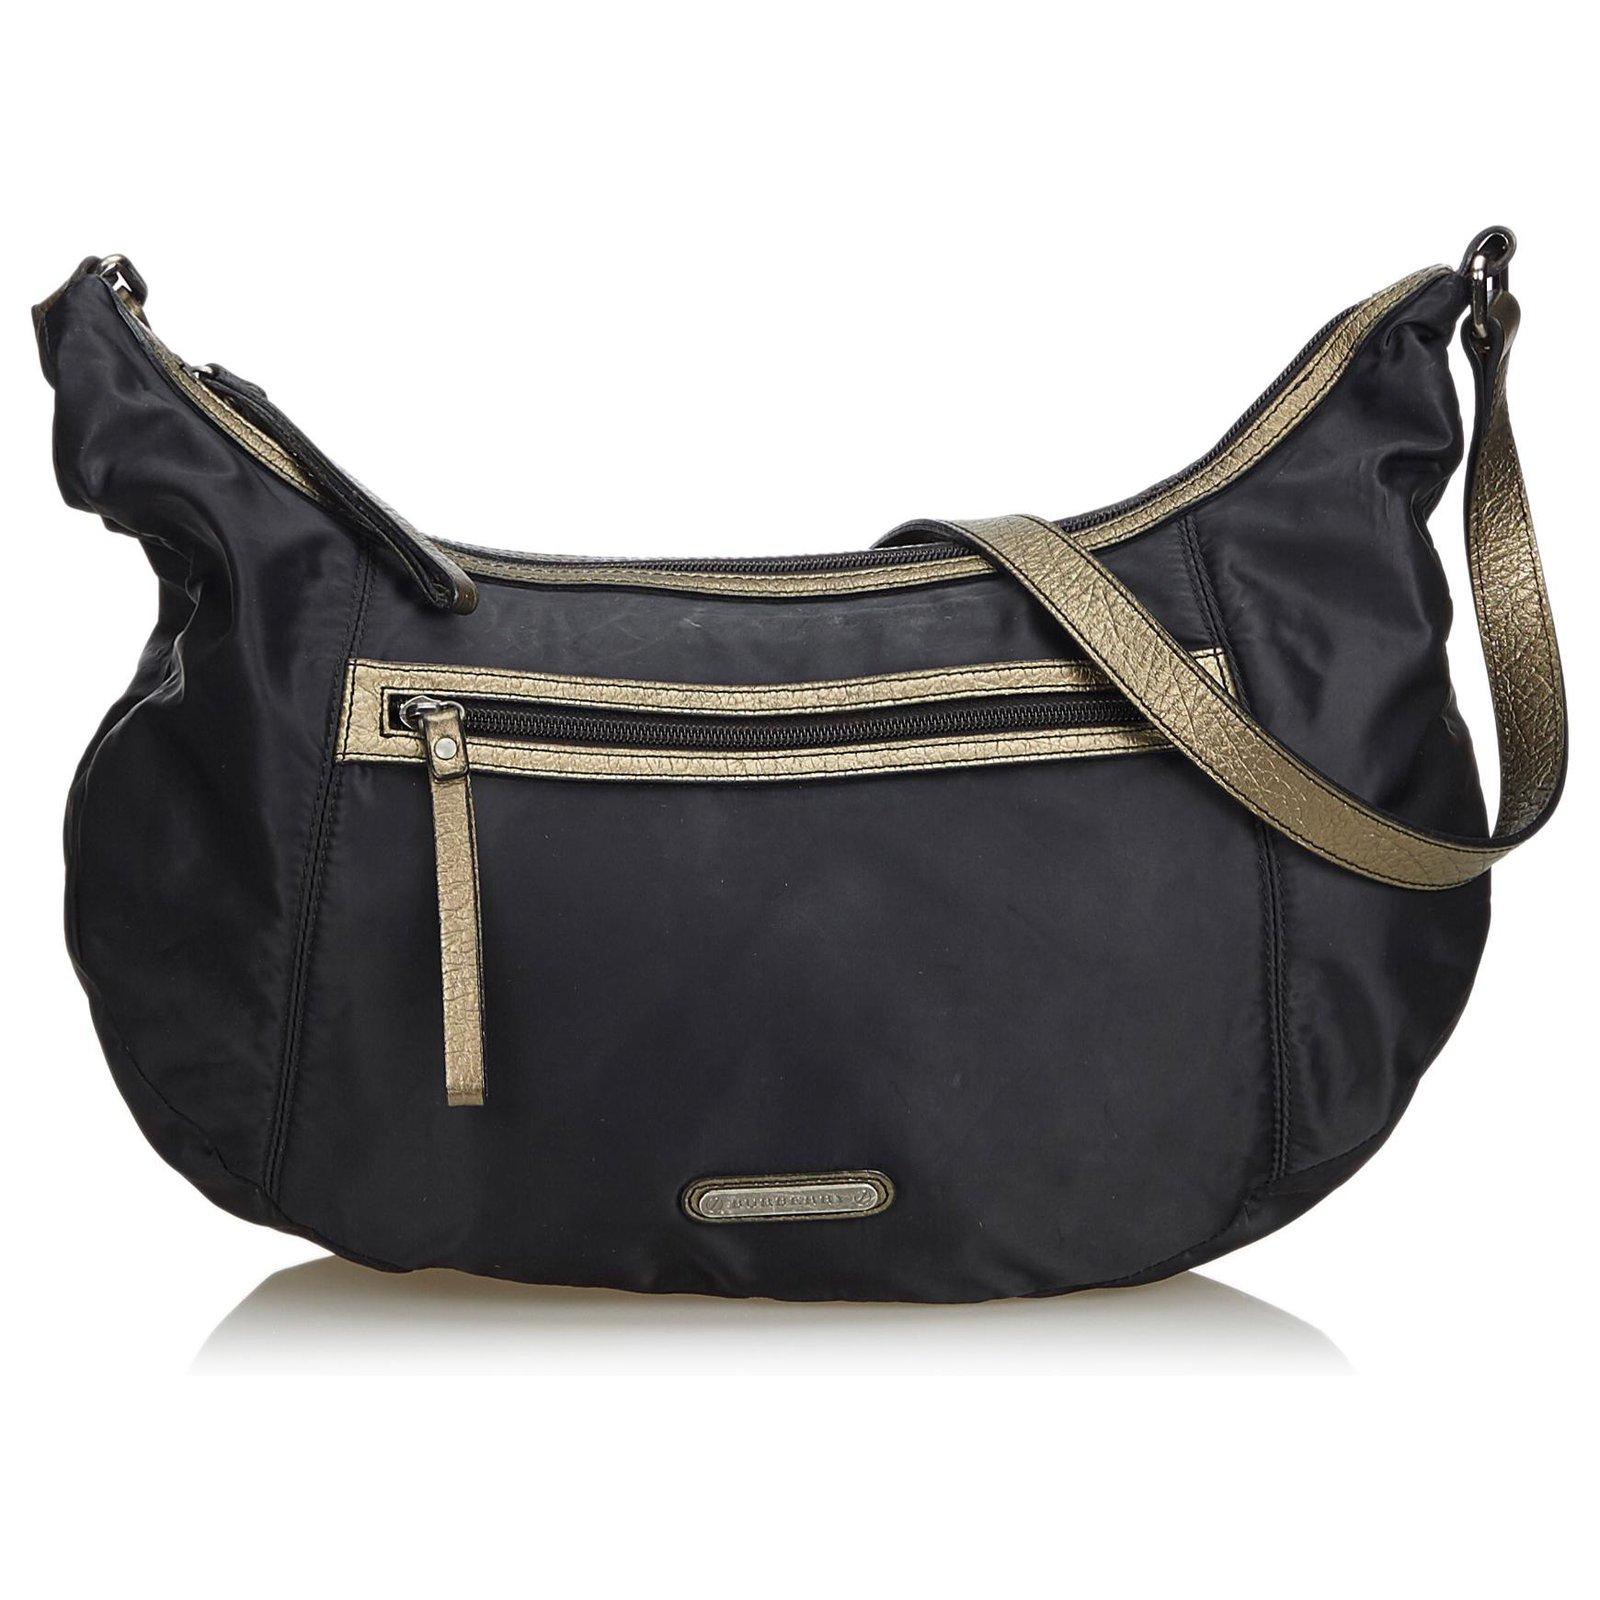 273dd5c91 Burberry Nylon Hobo Bag Handbags Leather,Other,Nylon,Cloth Black,Golden ref